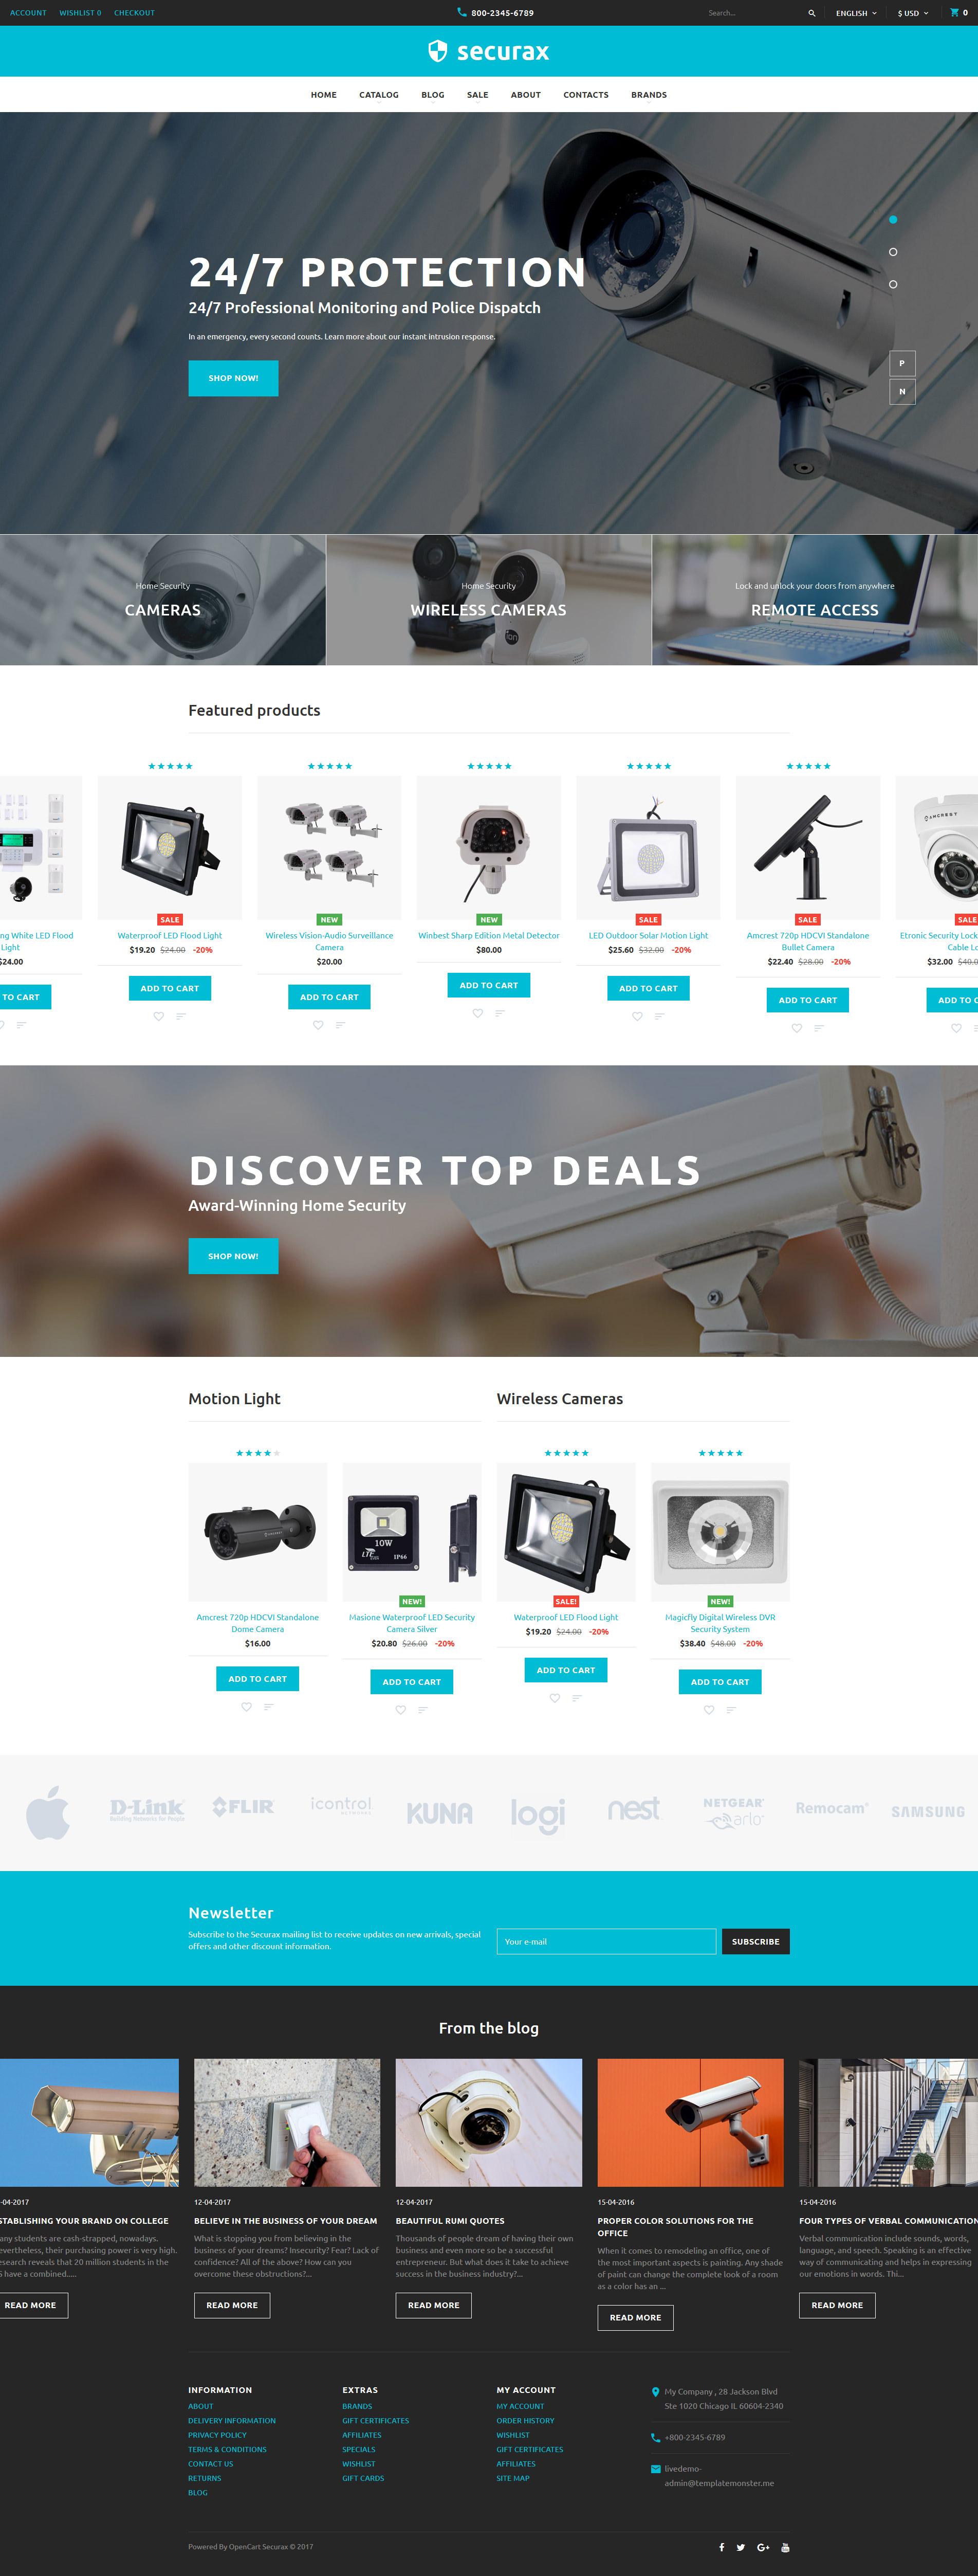 Securax - Security Equipment Store Responsive OpenCart Template - screenshot